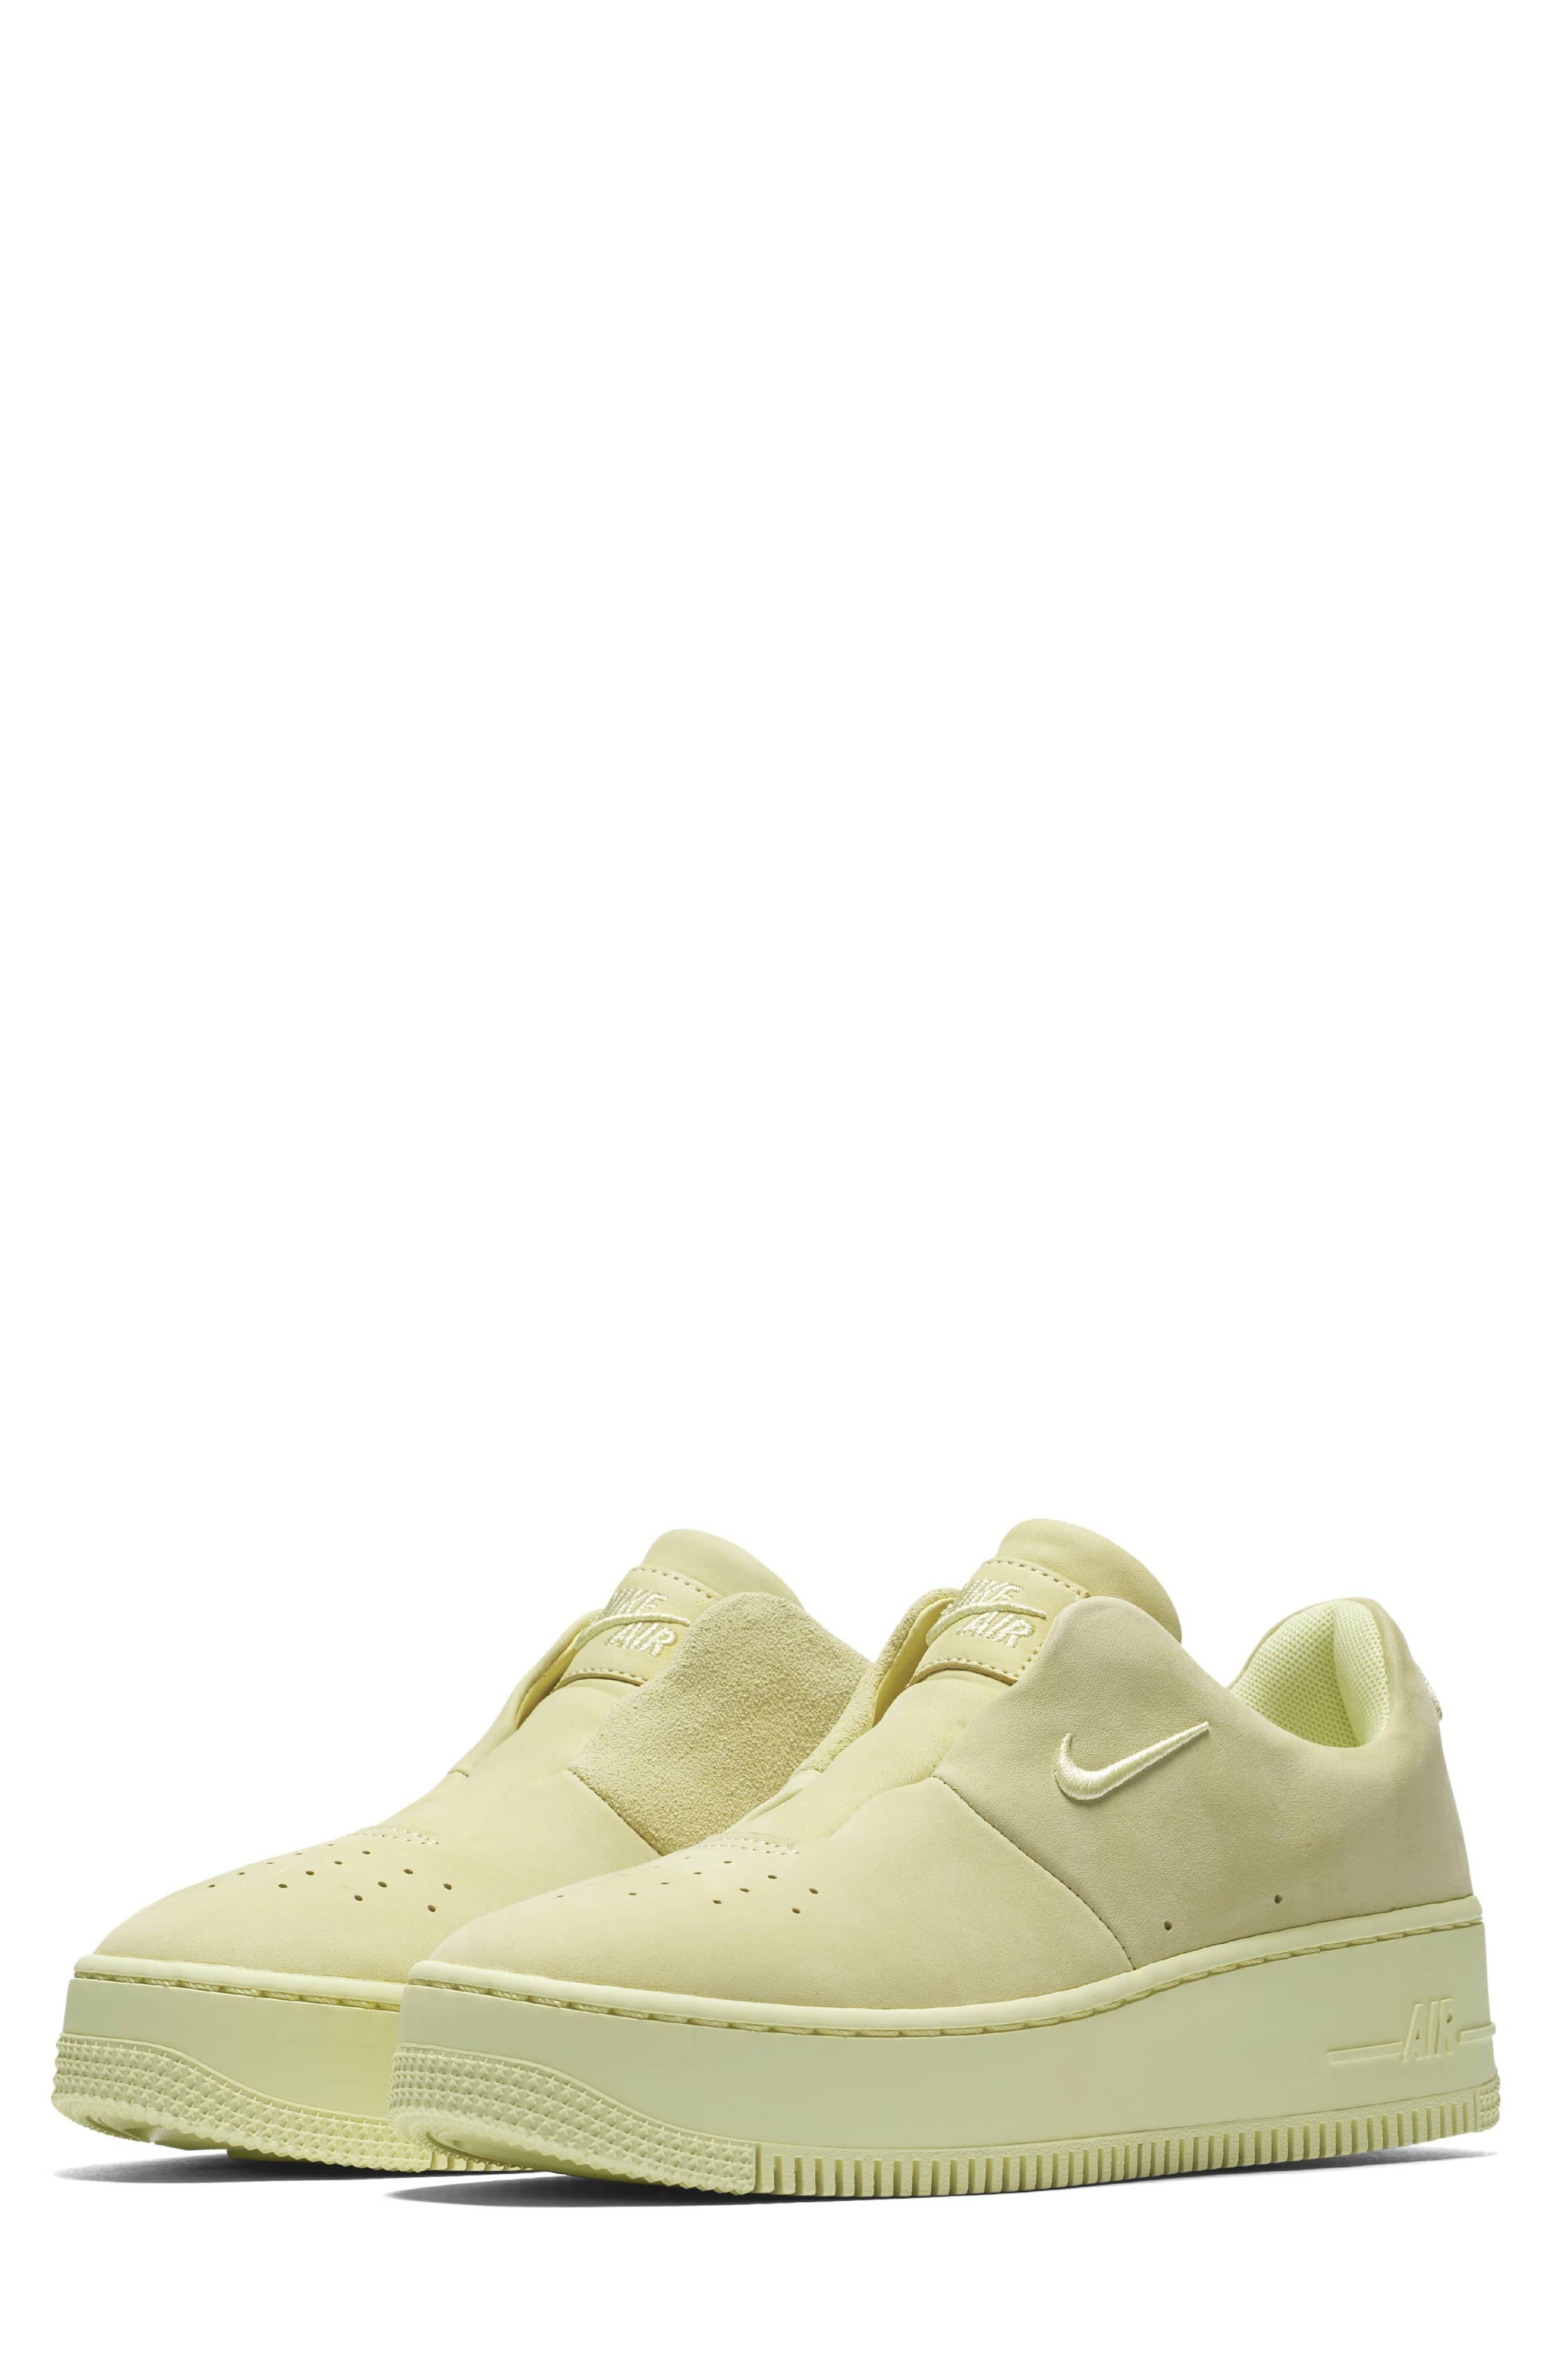 Air Force 1 Sage XX Sneaker,                             Main thumbnail 1, color,                             Luminous Green